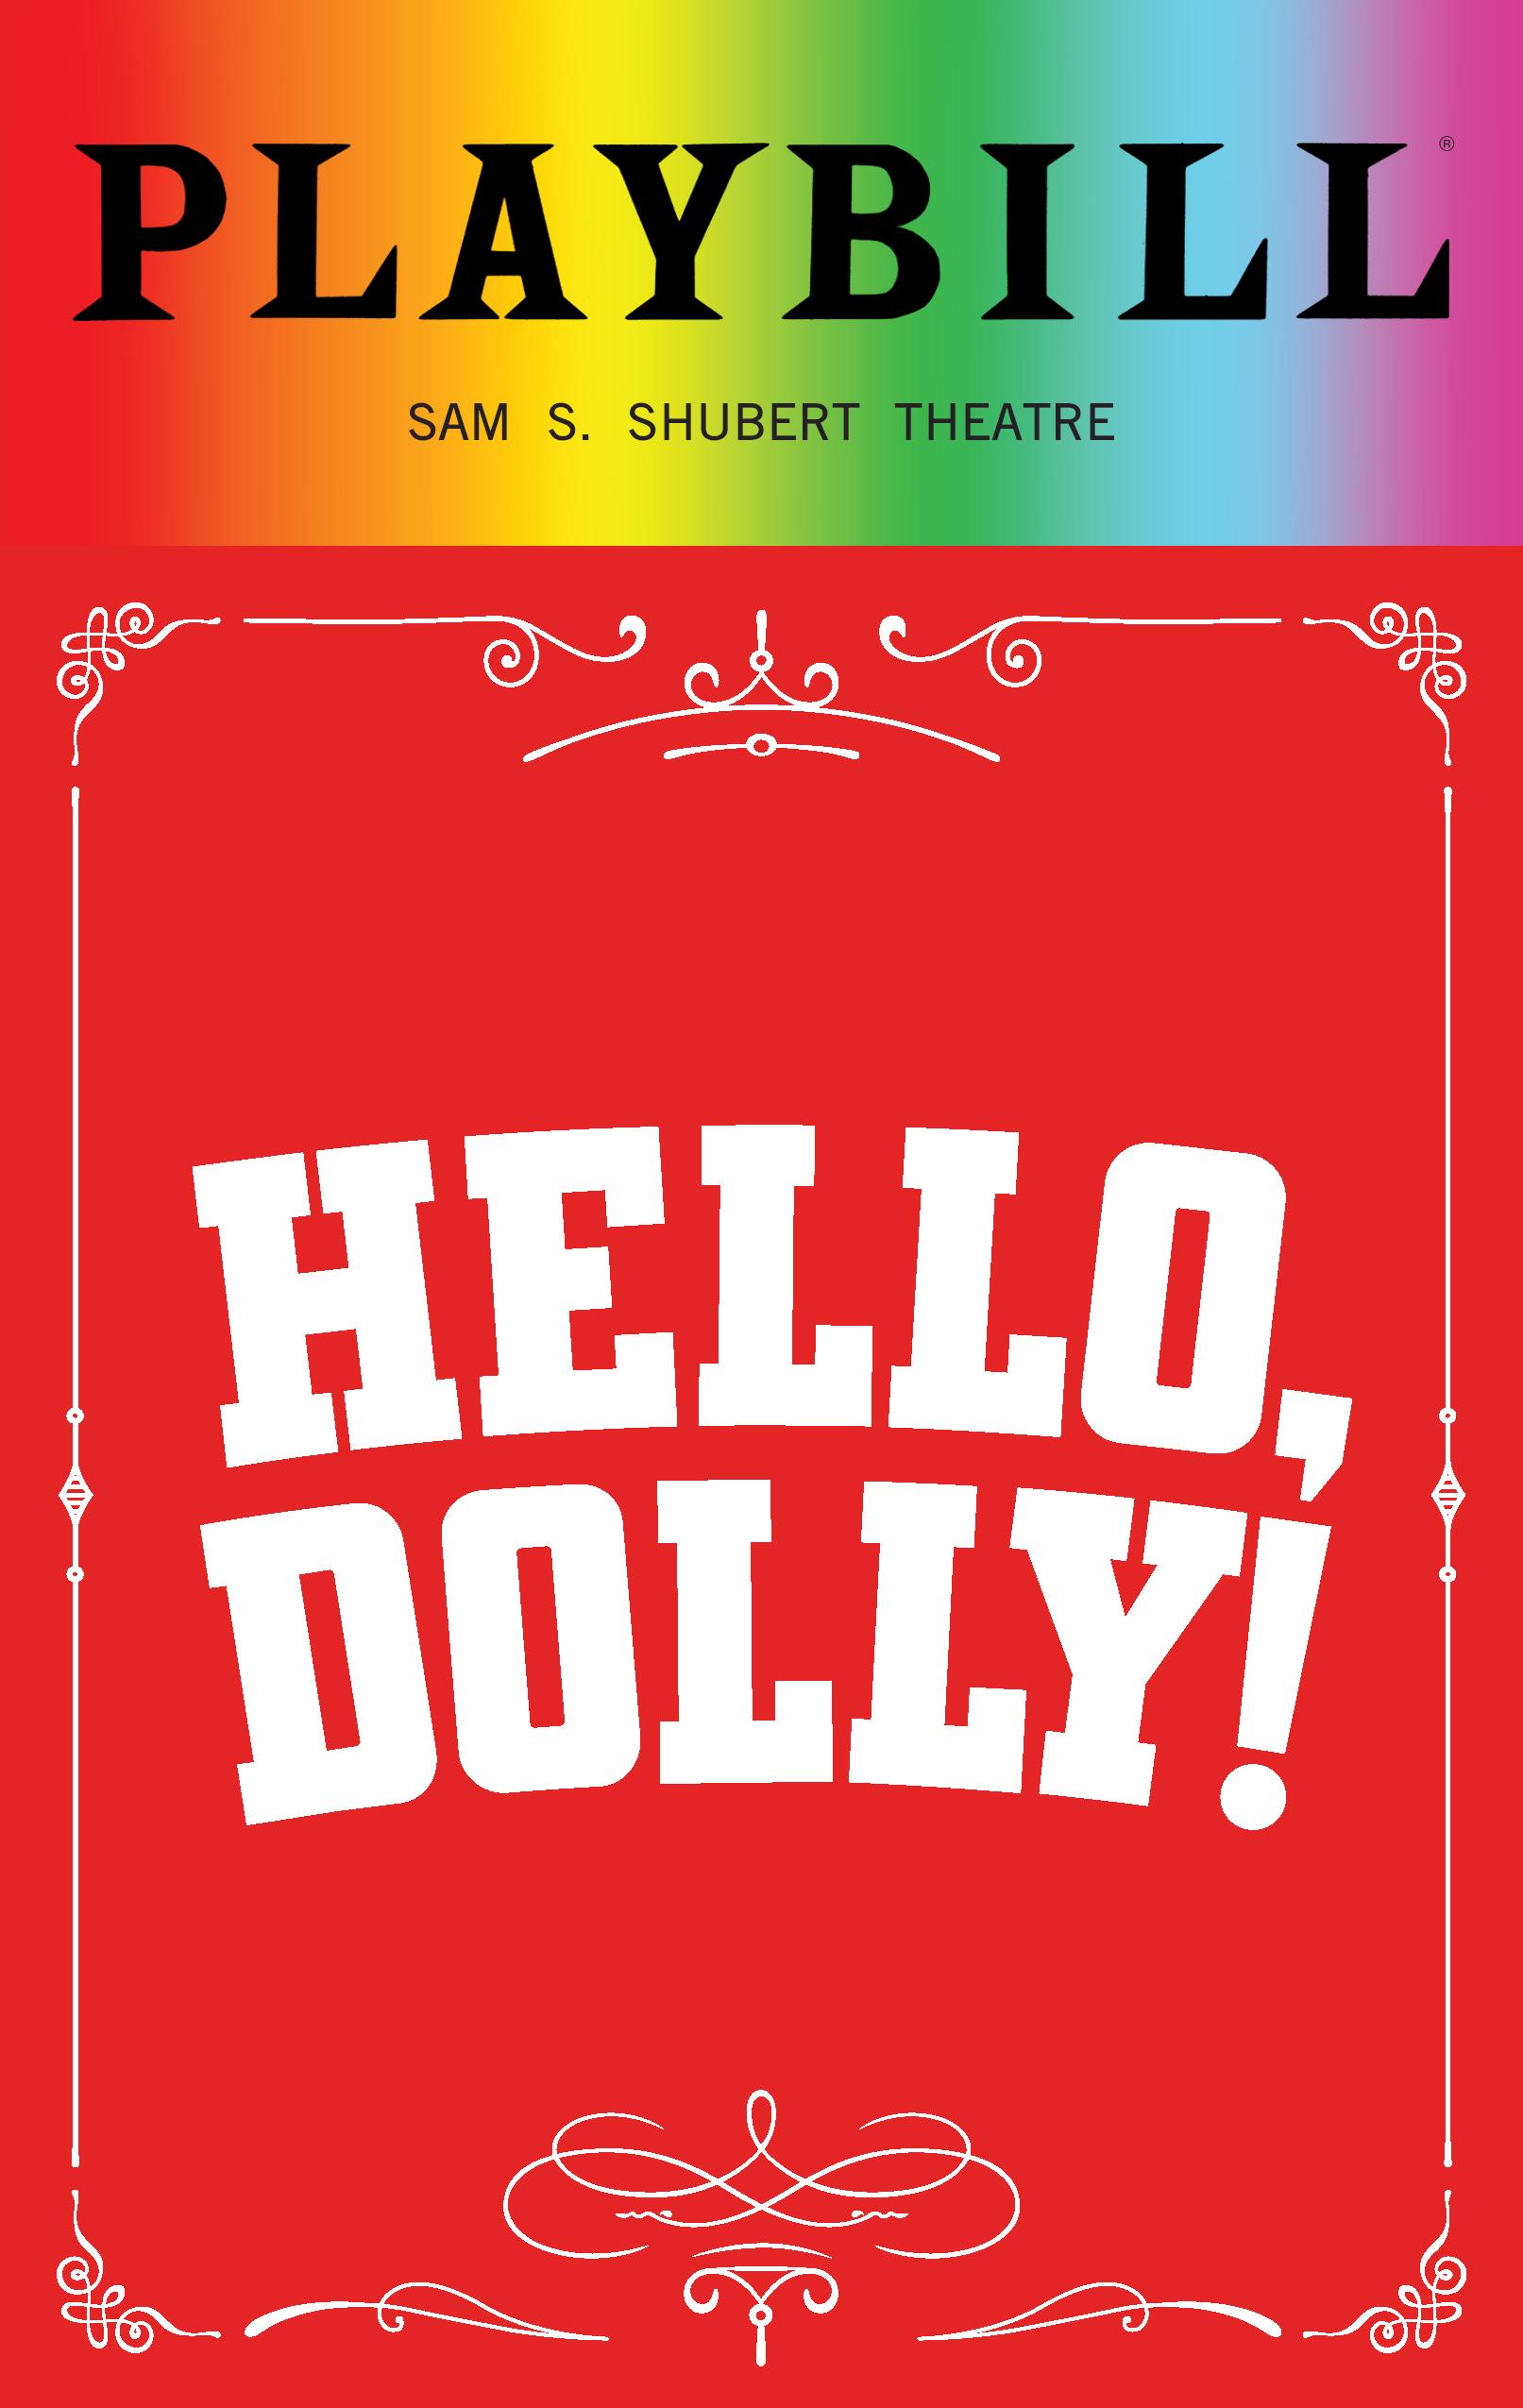 Hello Dolly June 2018 Playbill With Rainbow Pride Logo